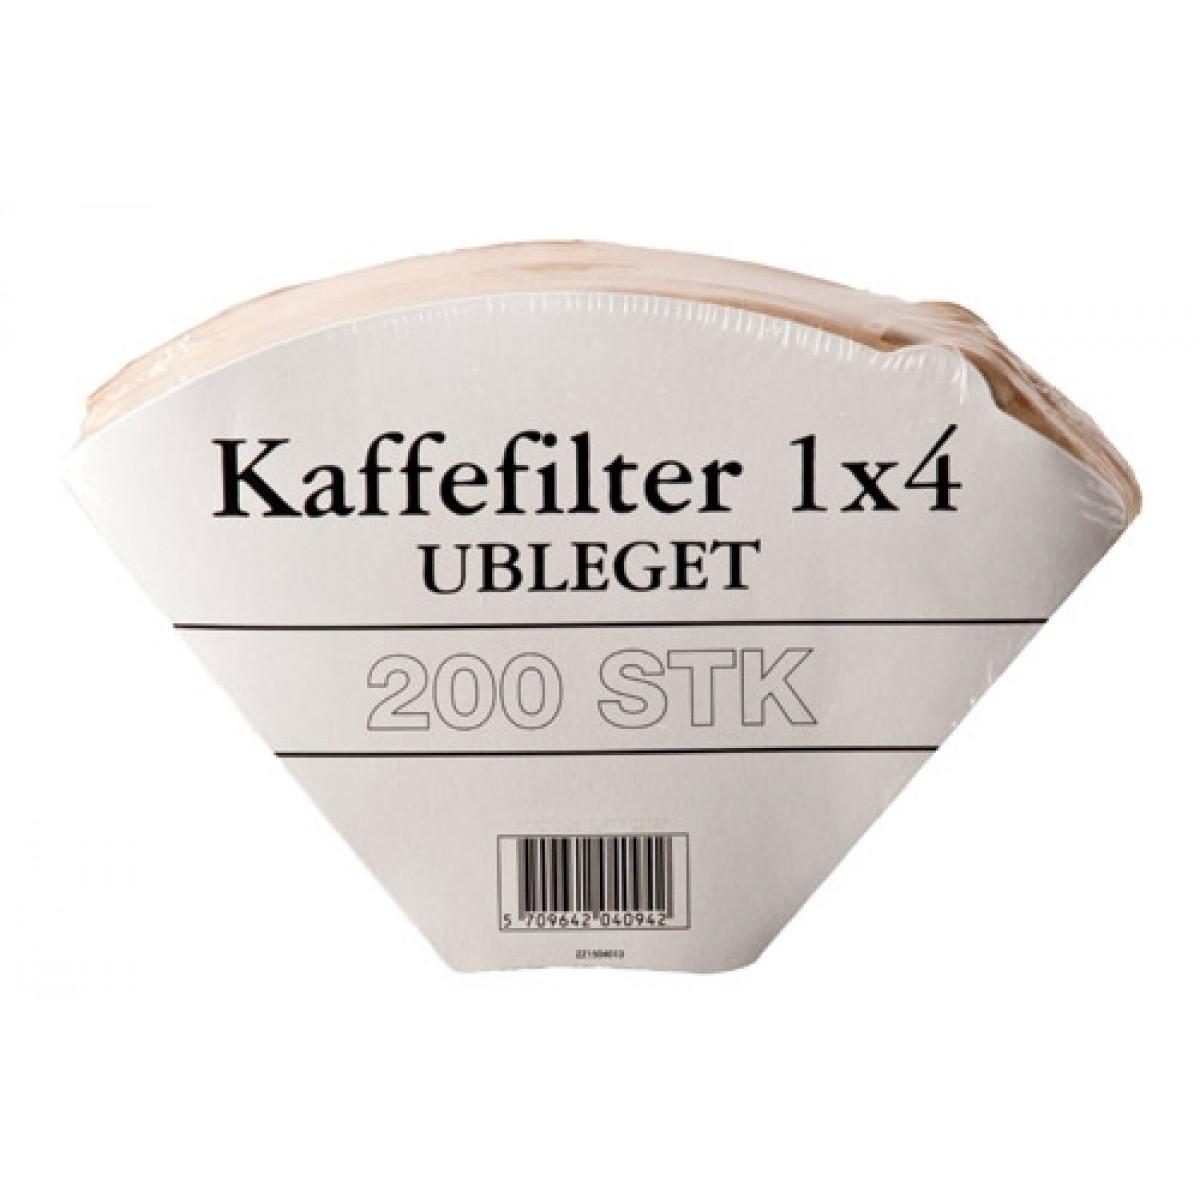 Filterpose1x4ubleget-31